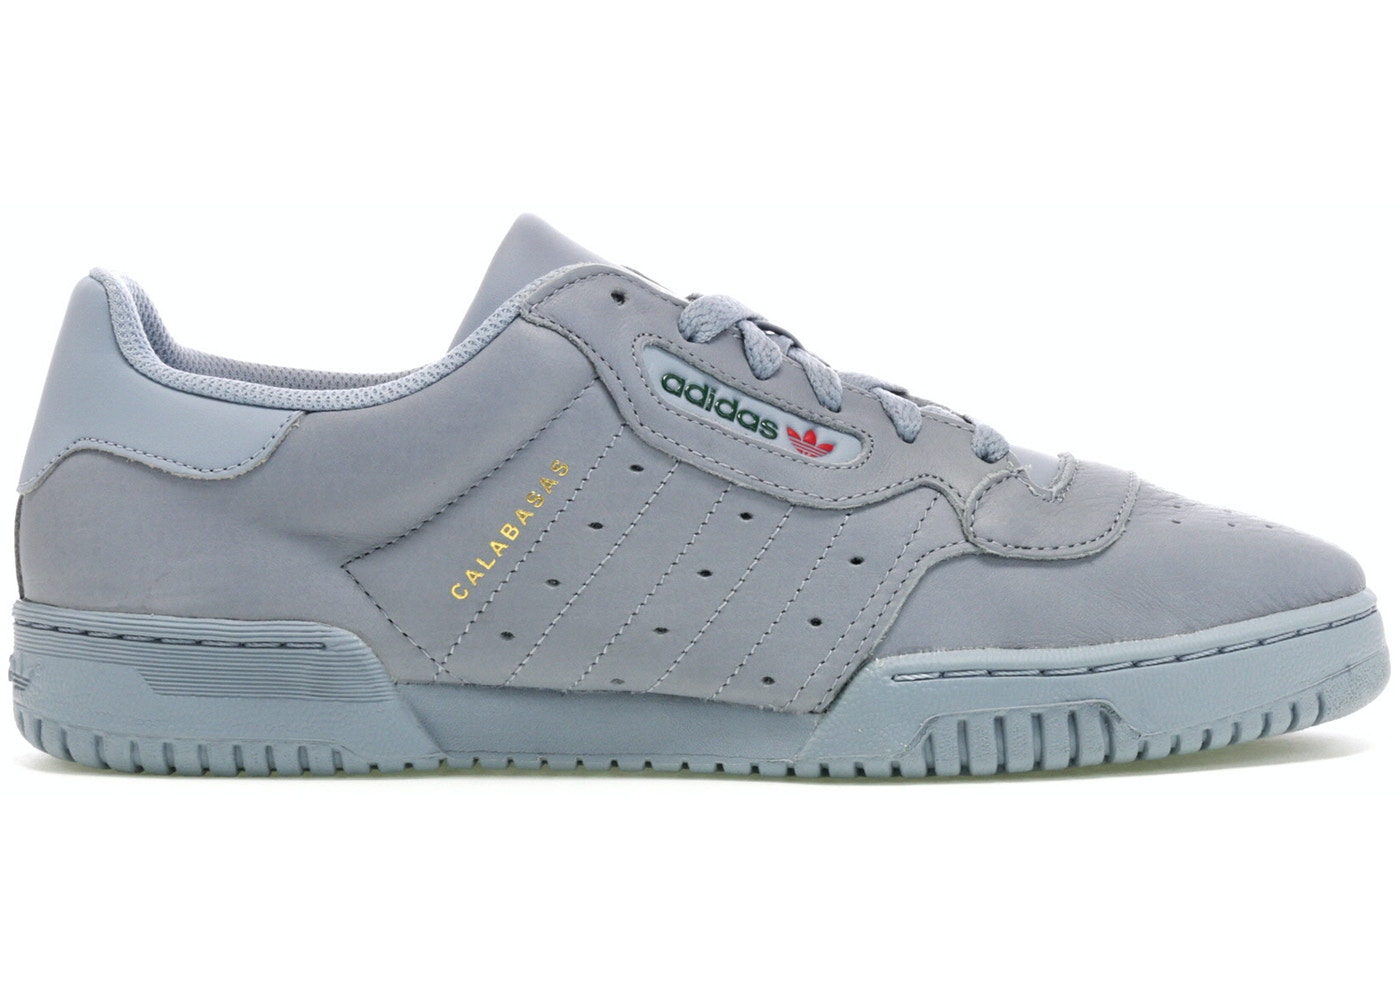 6a41c4c2a13 adidas Yeezy Powerphase Calabasas Grey - CG6422